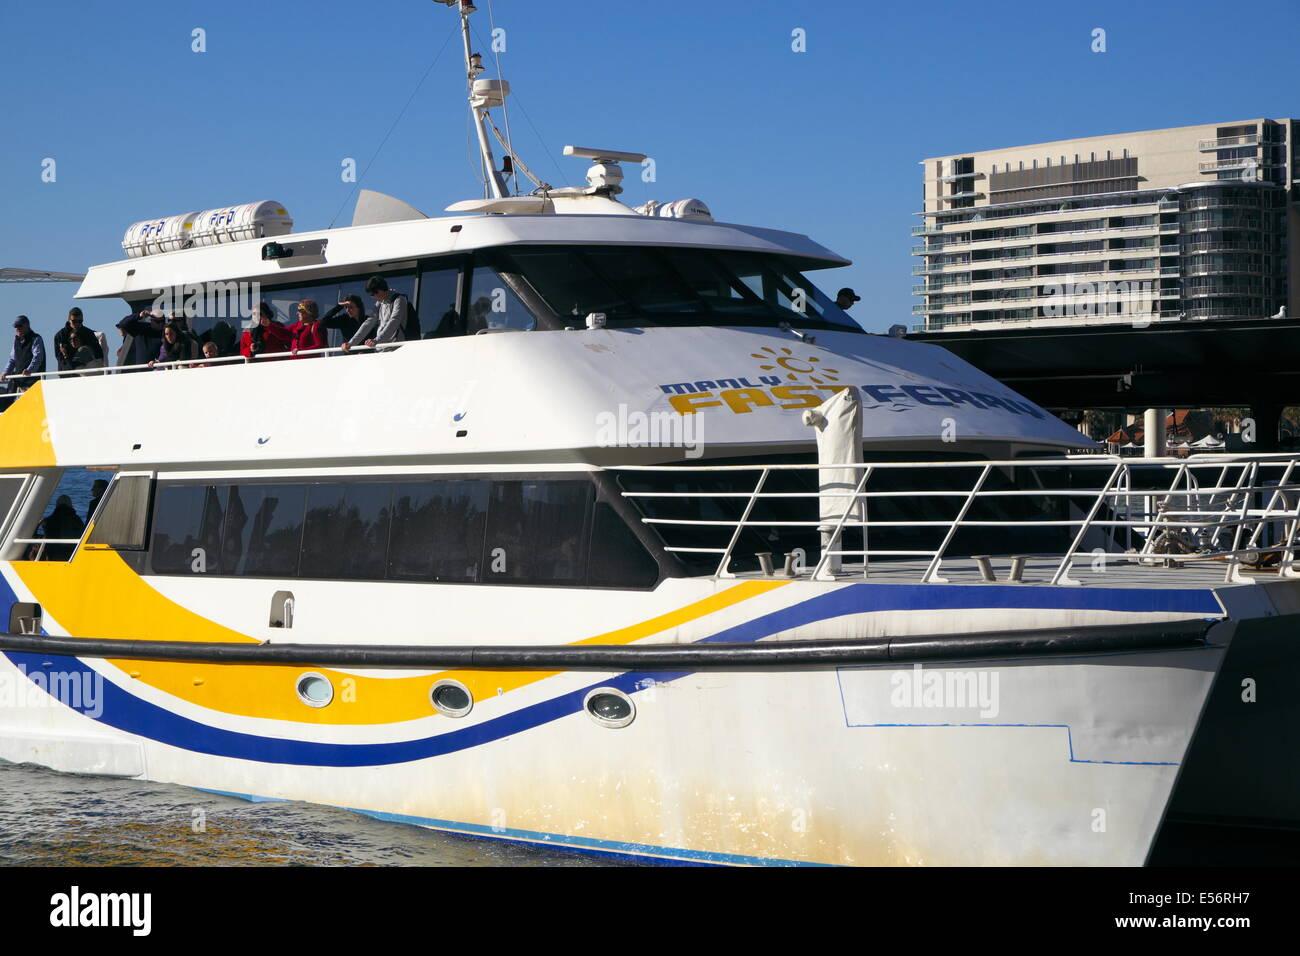 Manly fast ferry sydney ferry ferries at Circular quay